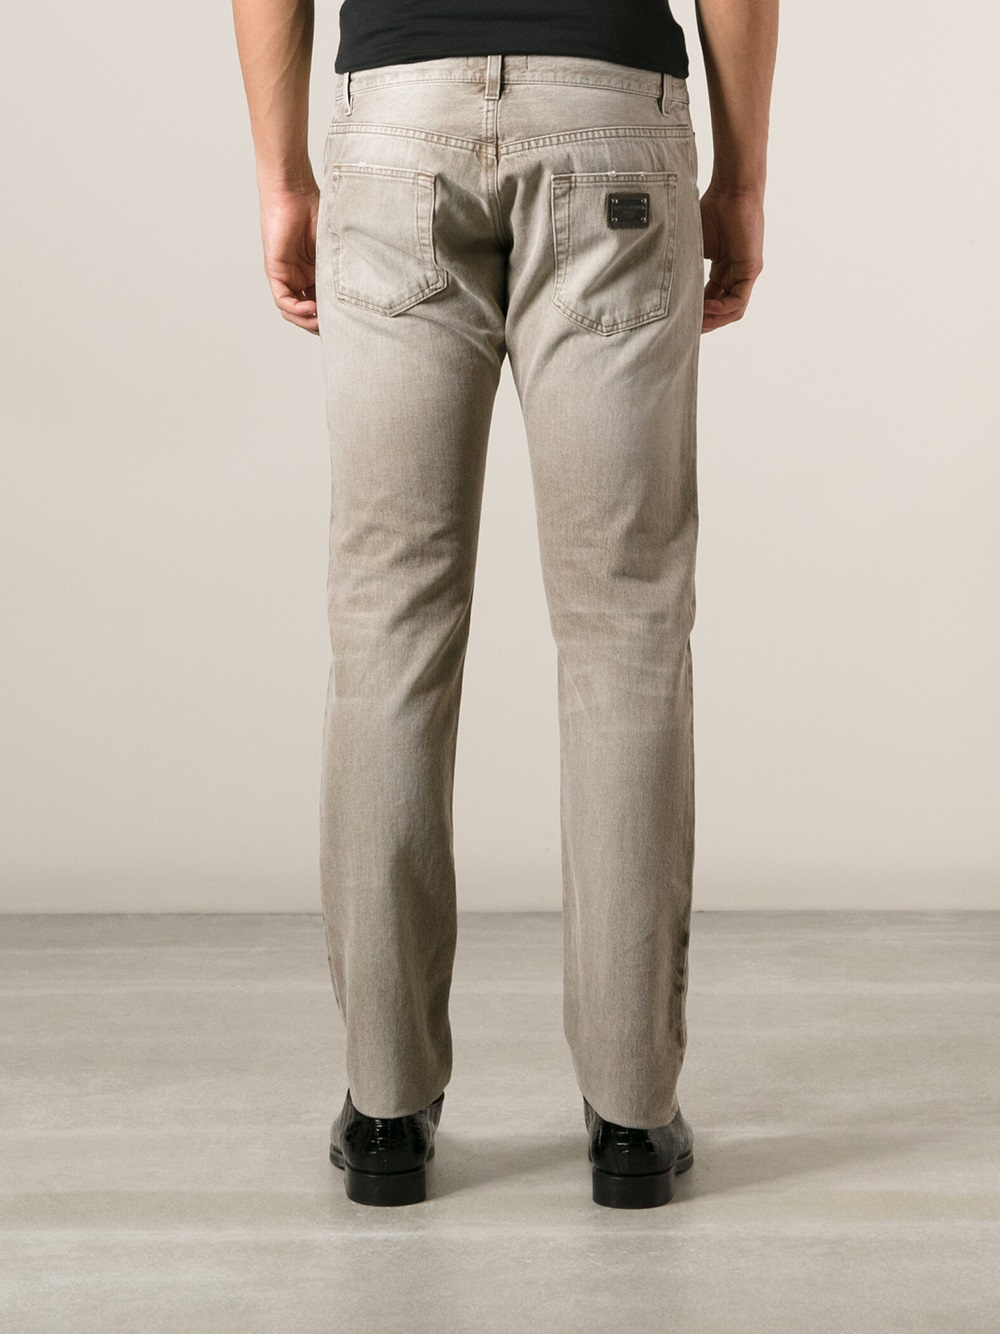 Dolce & Gabbana Slim Jeans in Natural for Men